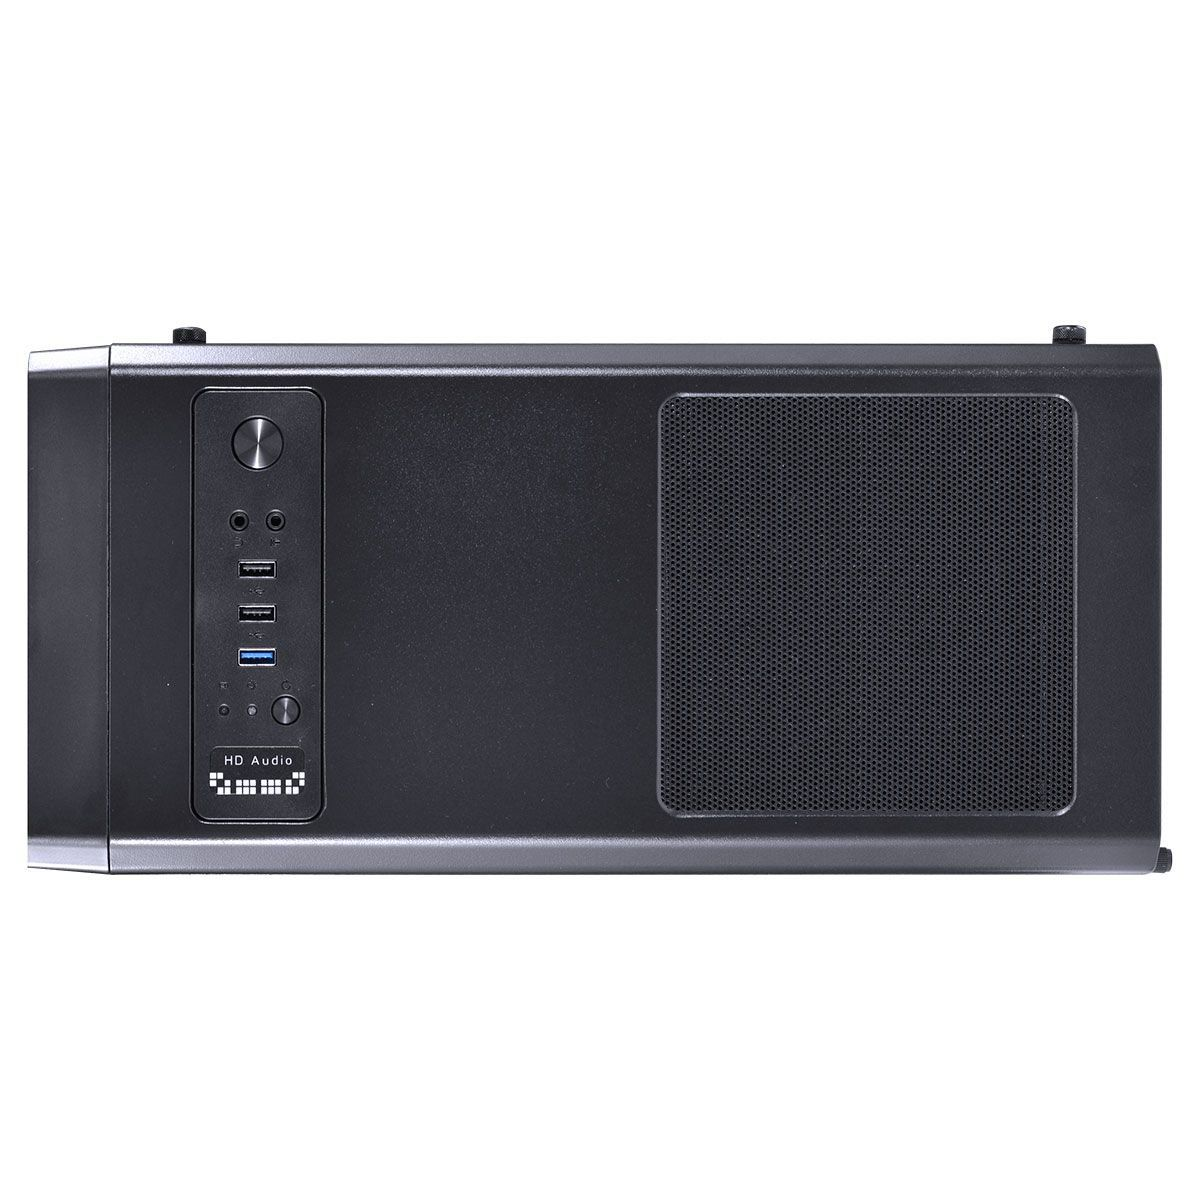 Gabinete ATX Gamer Lumia Preto com 7 Cores LED 3 Fans RGB e Acrílico Full Window 09GALM7-3RGB - Vinik